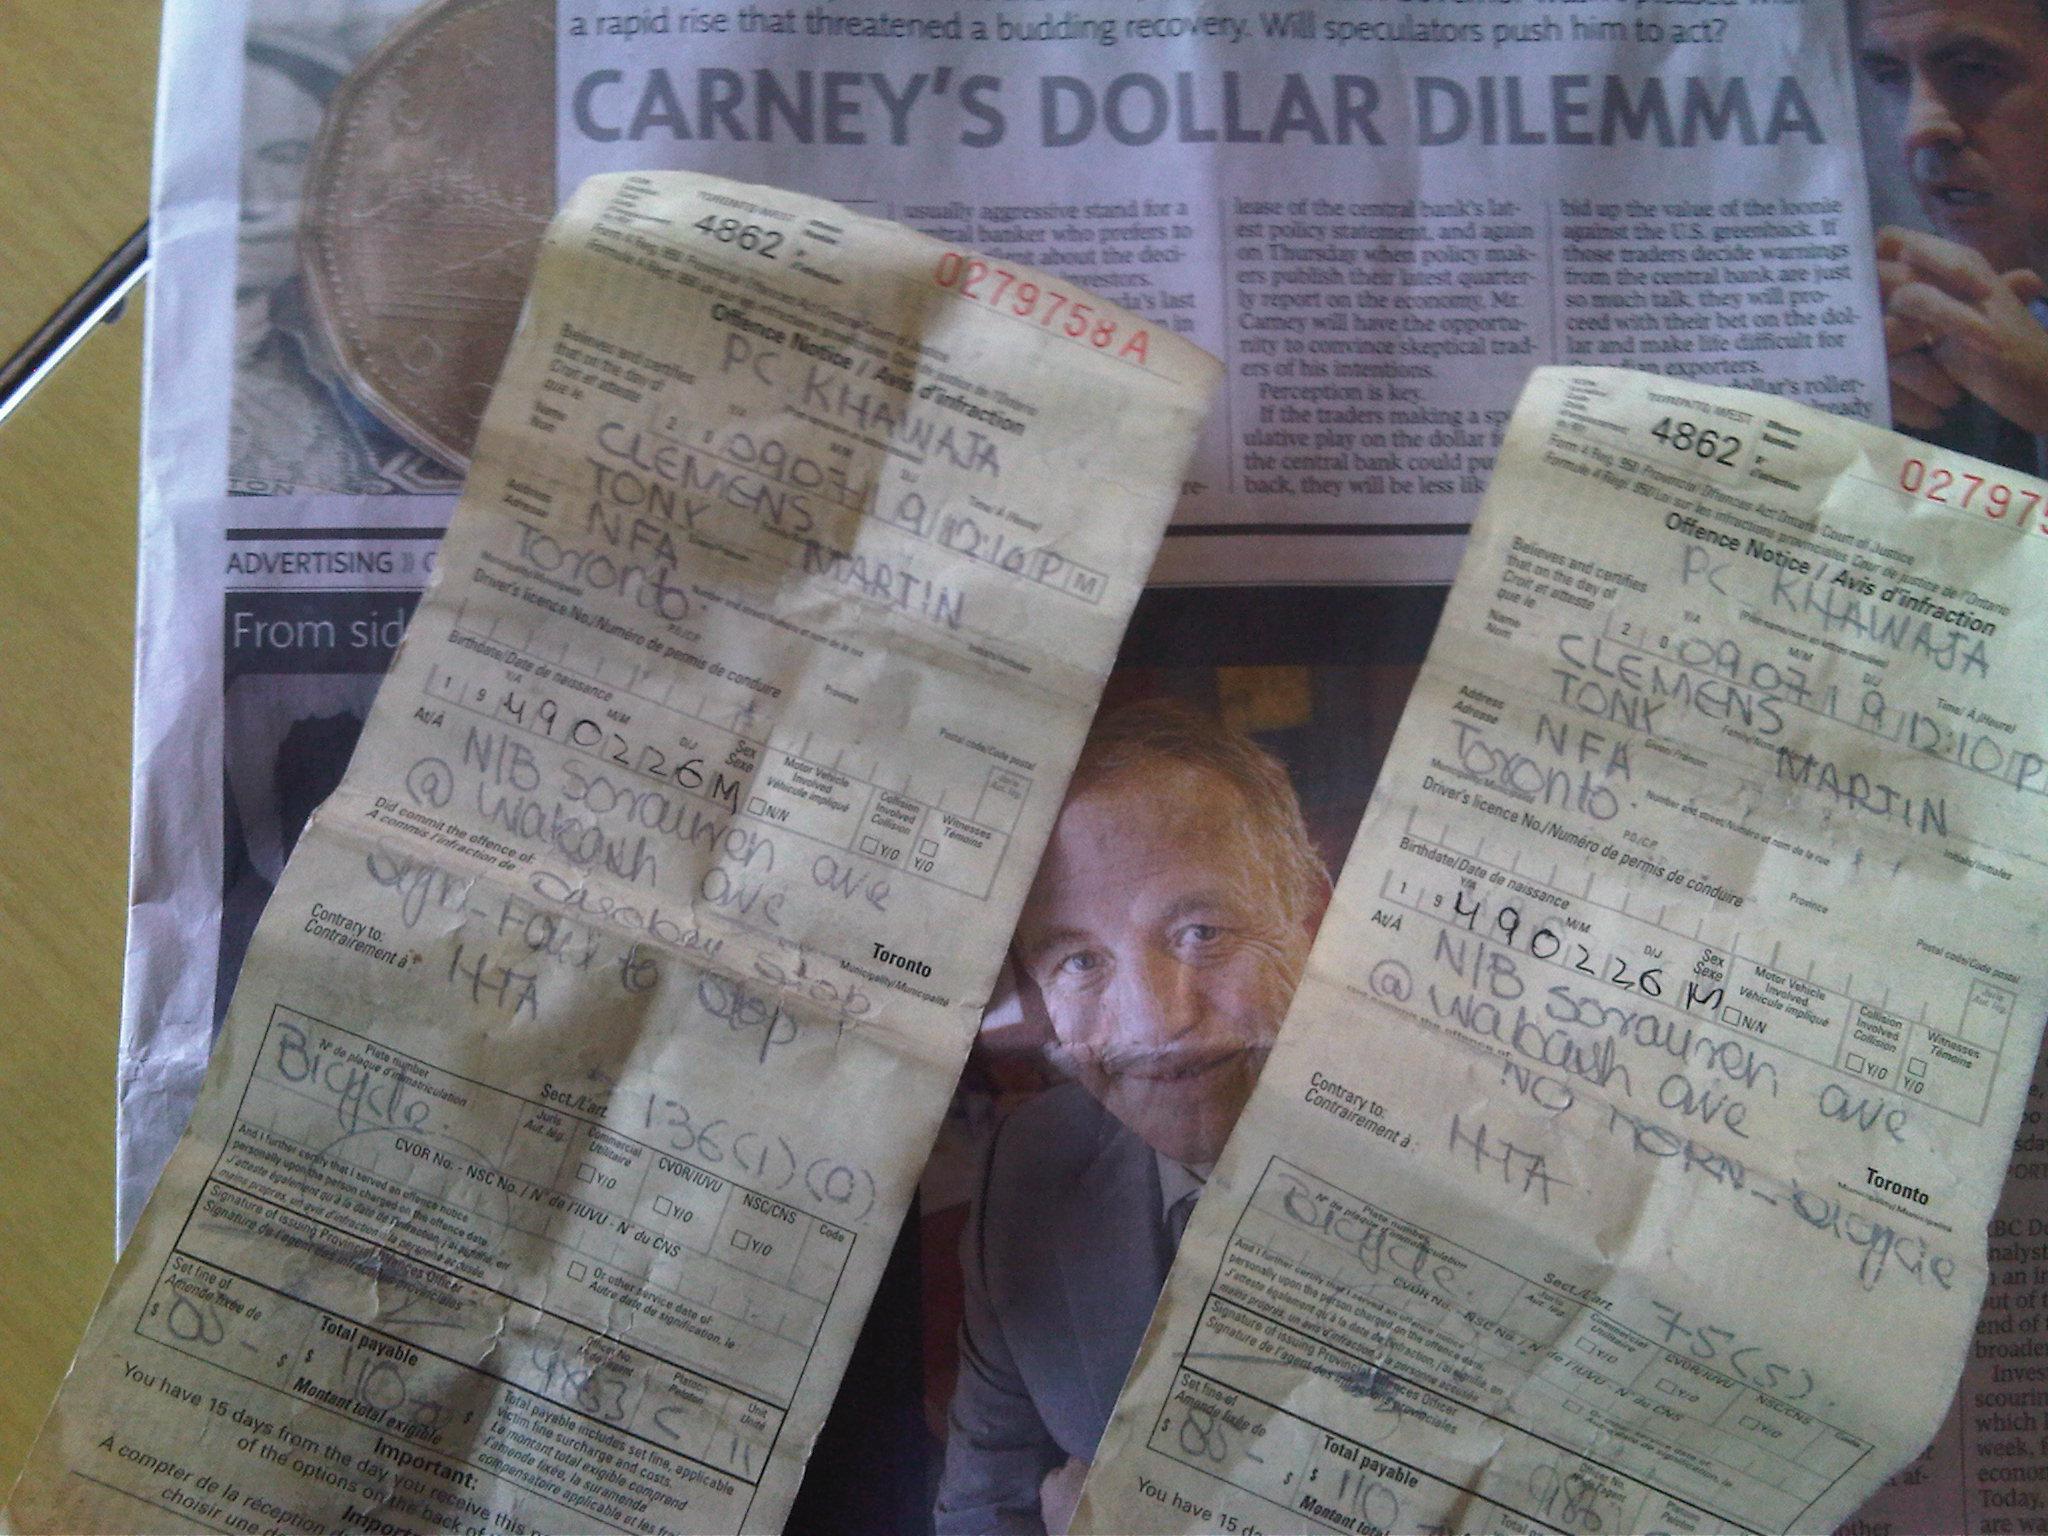 220 dollars - Jul 23 2009